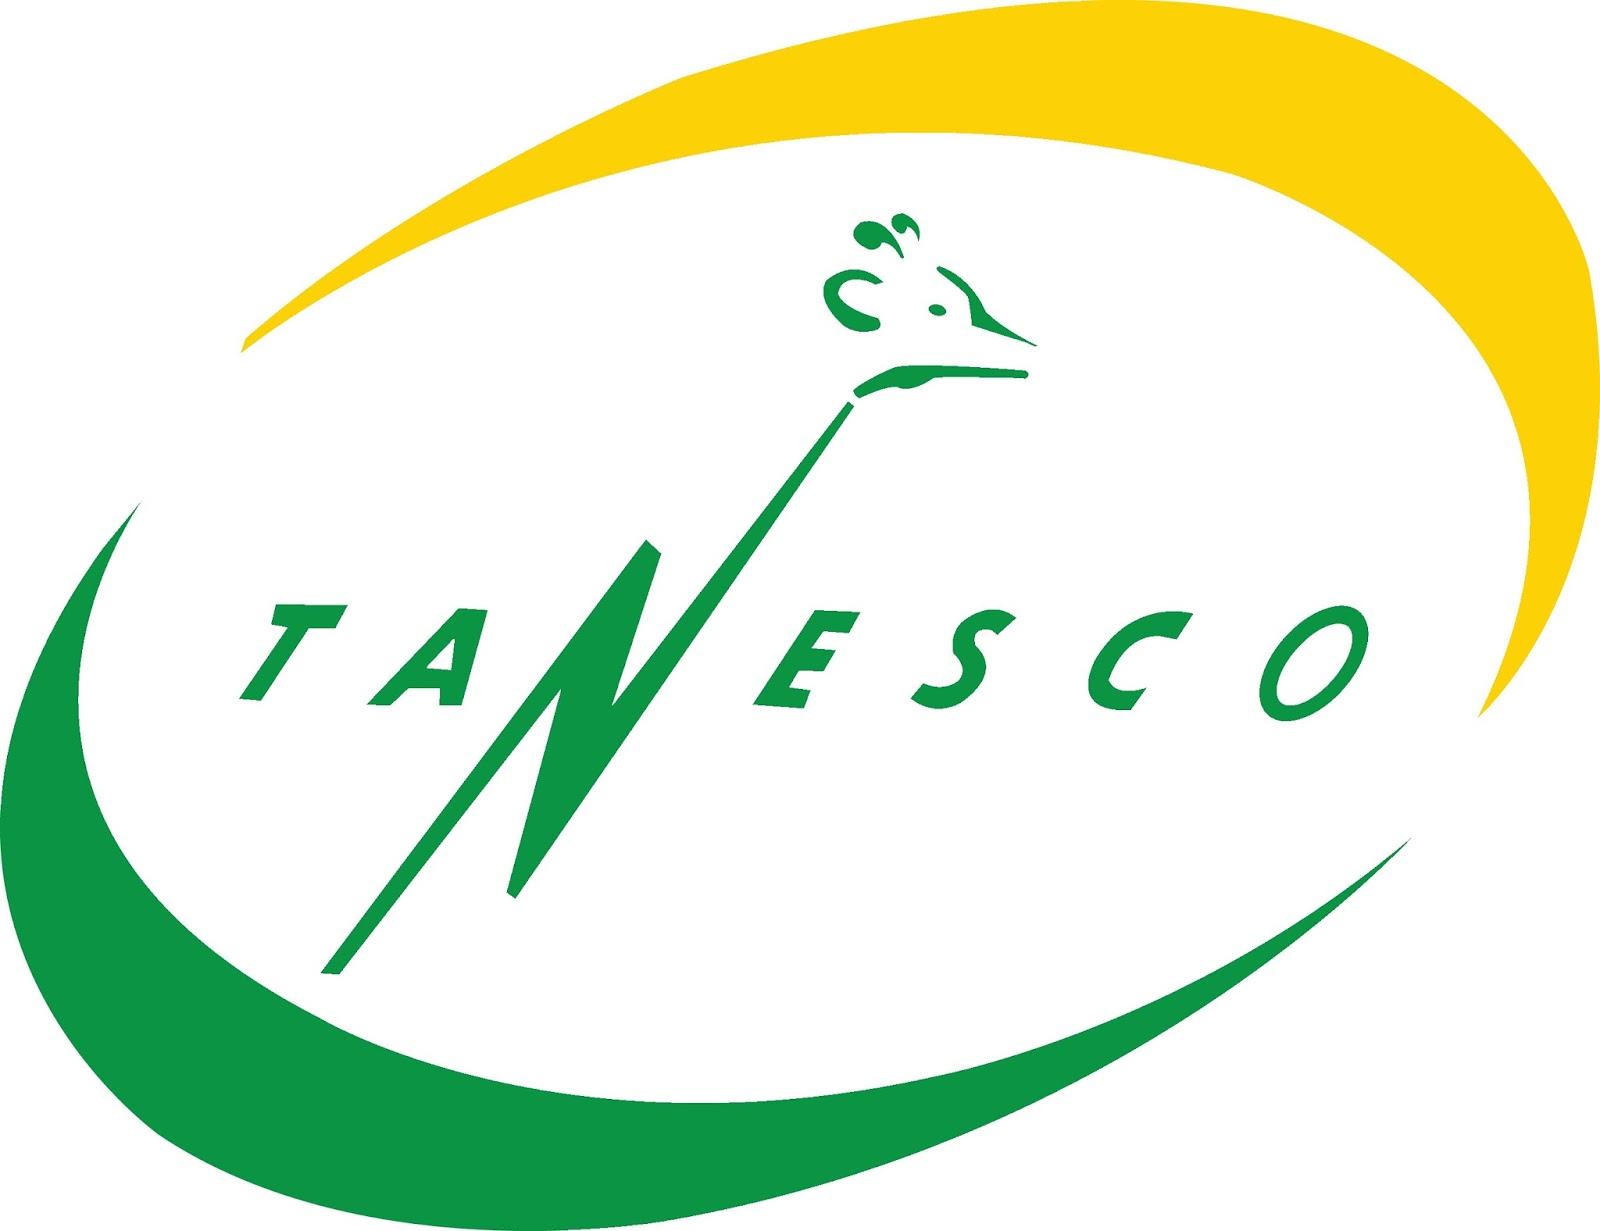 Tanzania Electric Supply Company Limited